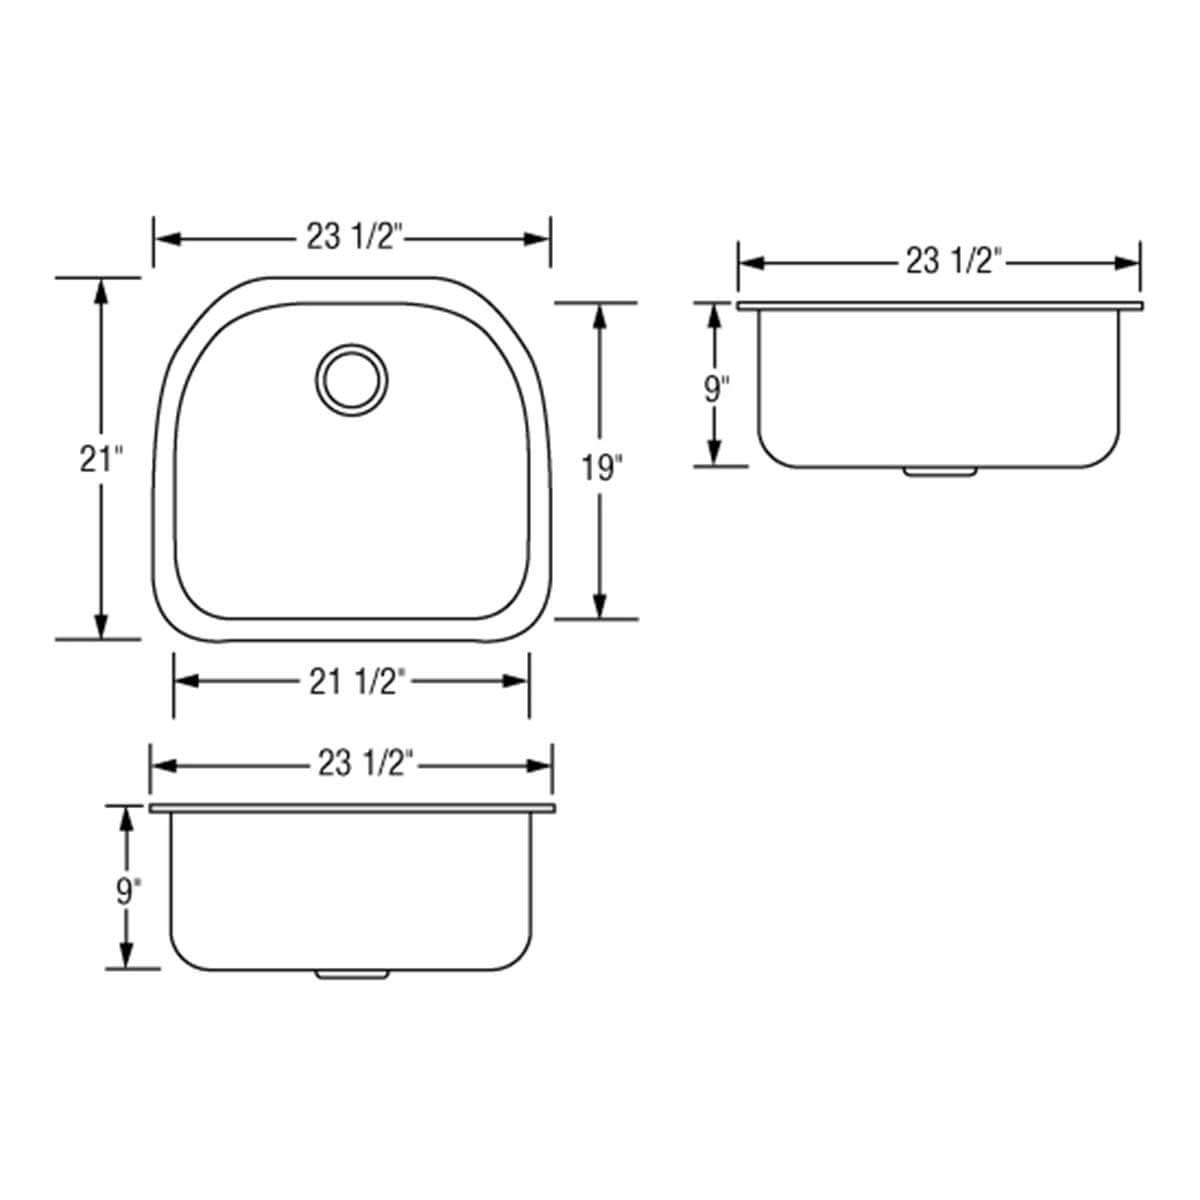 Artisan Sinks AR2321-D9 Drawing